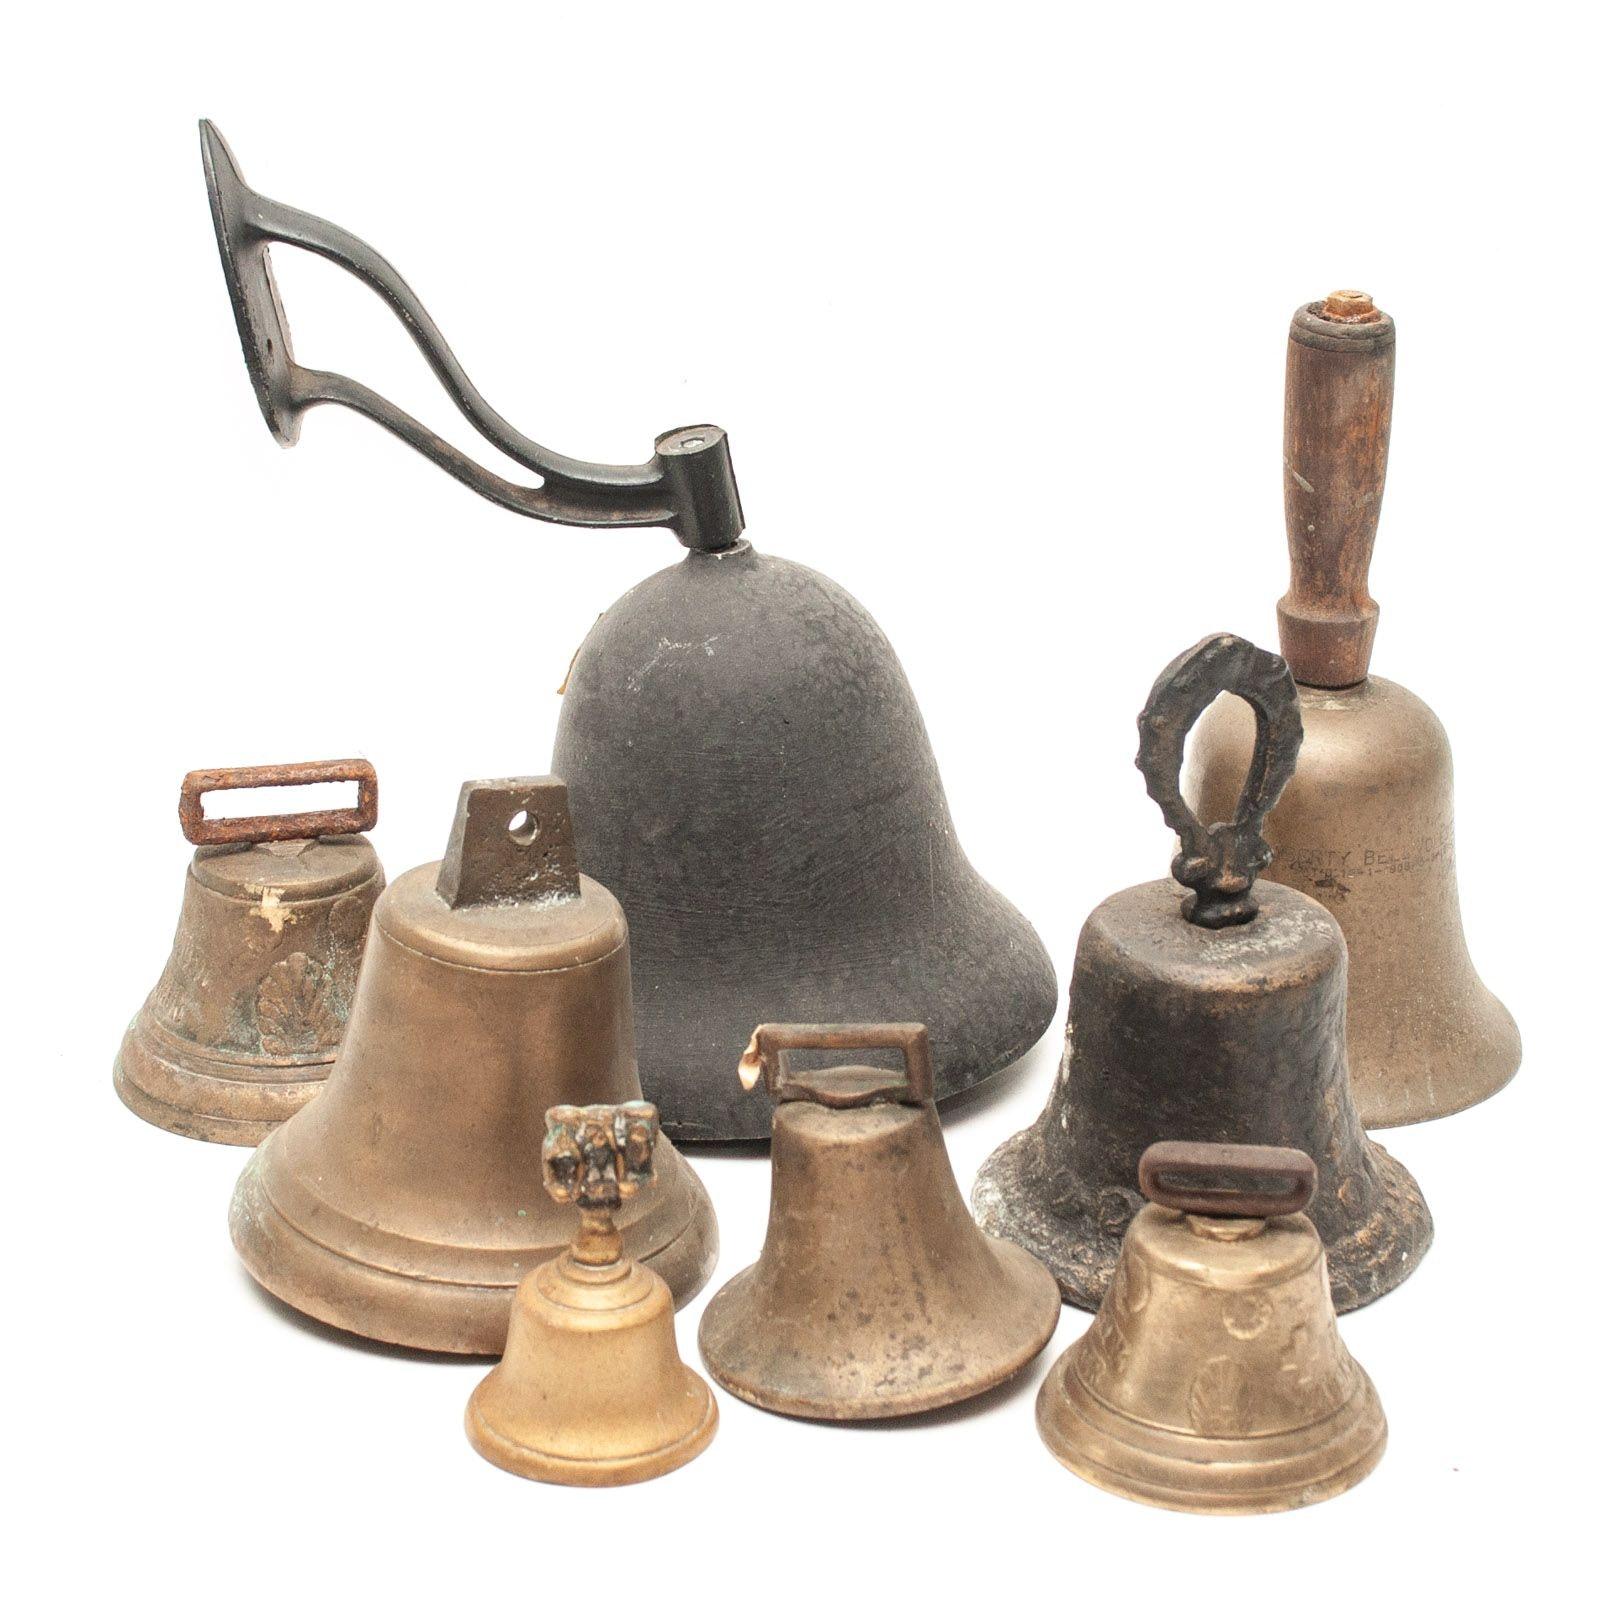 Antique Brass and Iron Bells